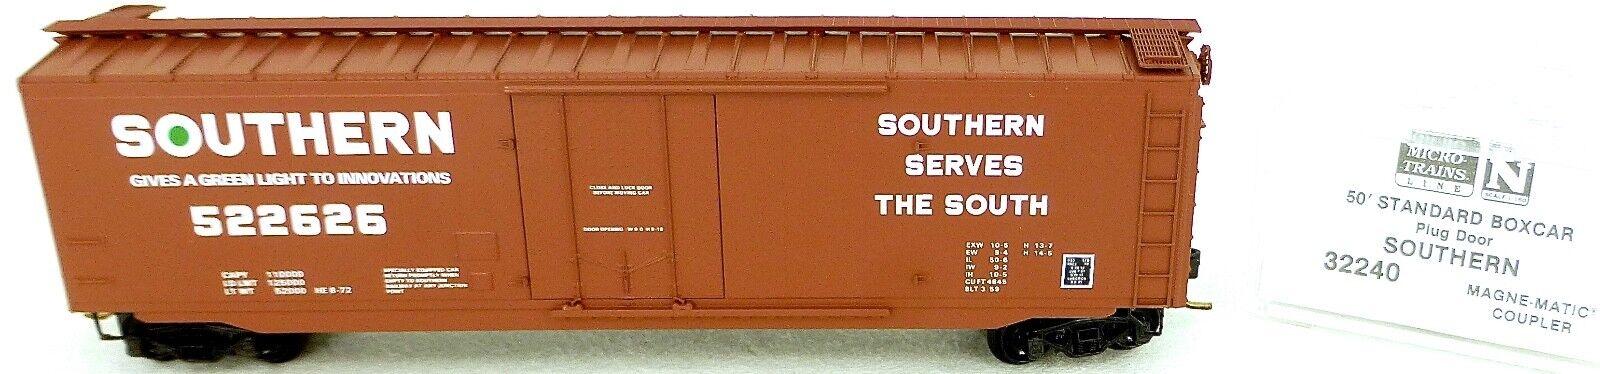 50 ´ Standard Boxcar Southern 522626 Micro Trains Line 32240 N 1 160 C Å